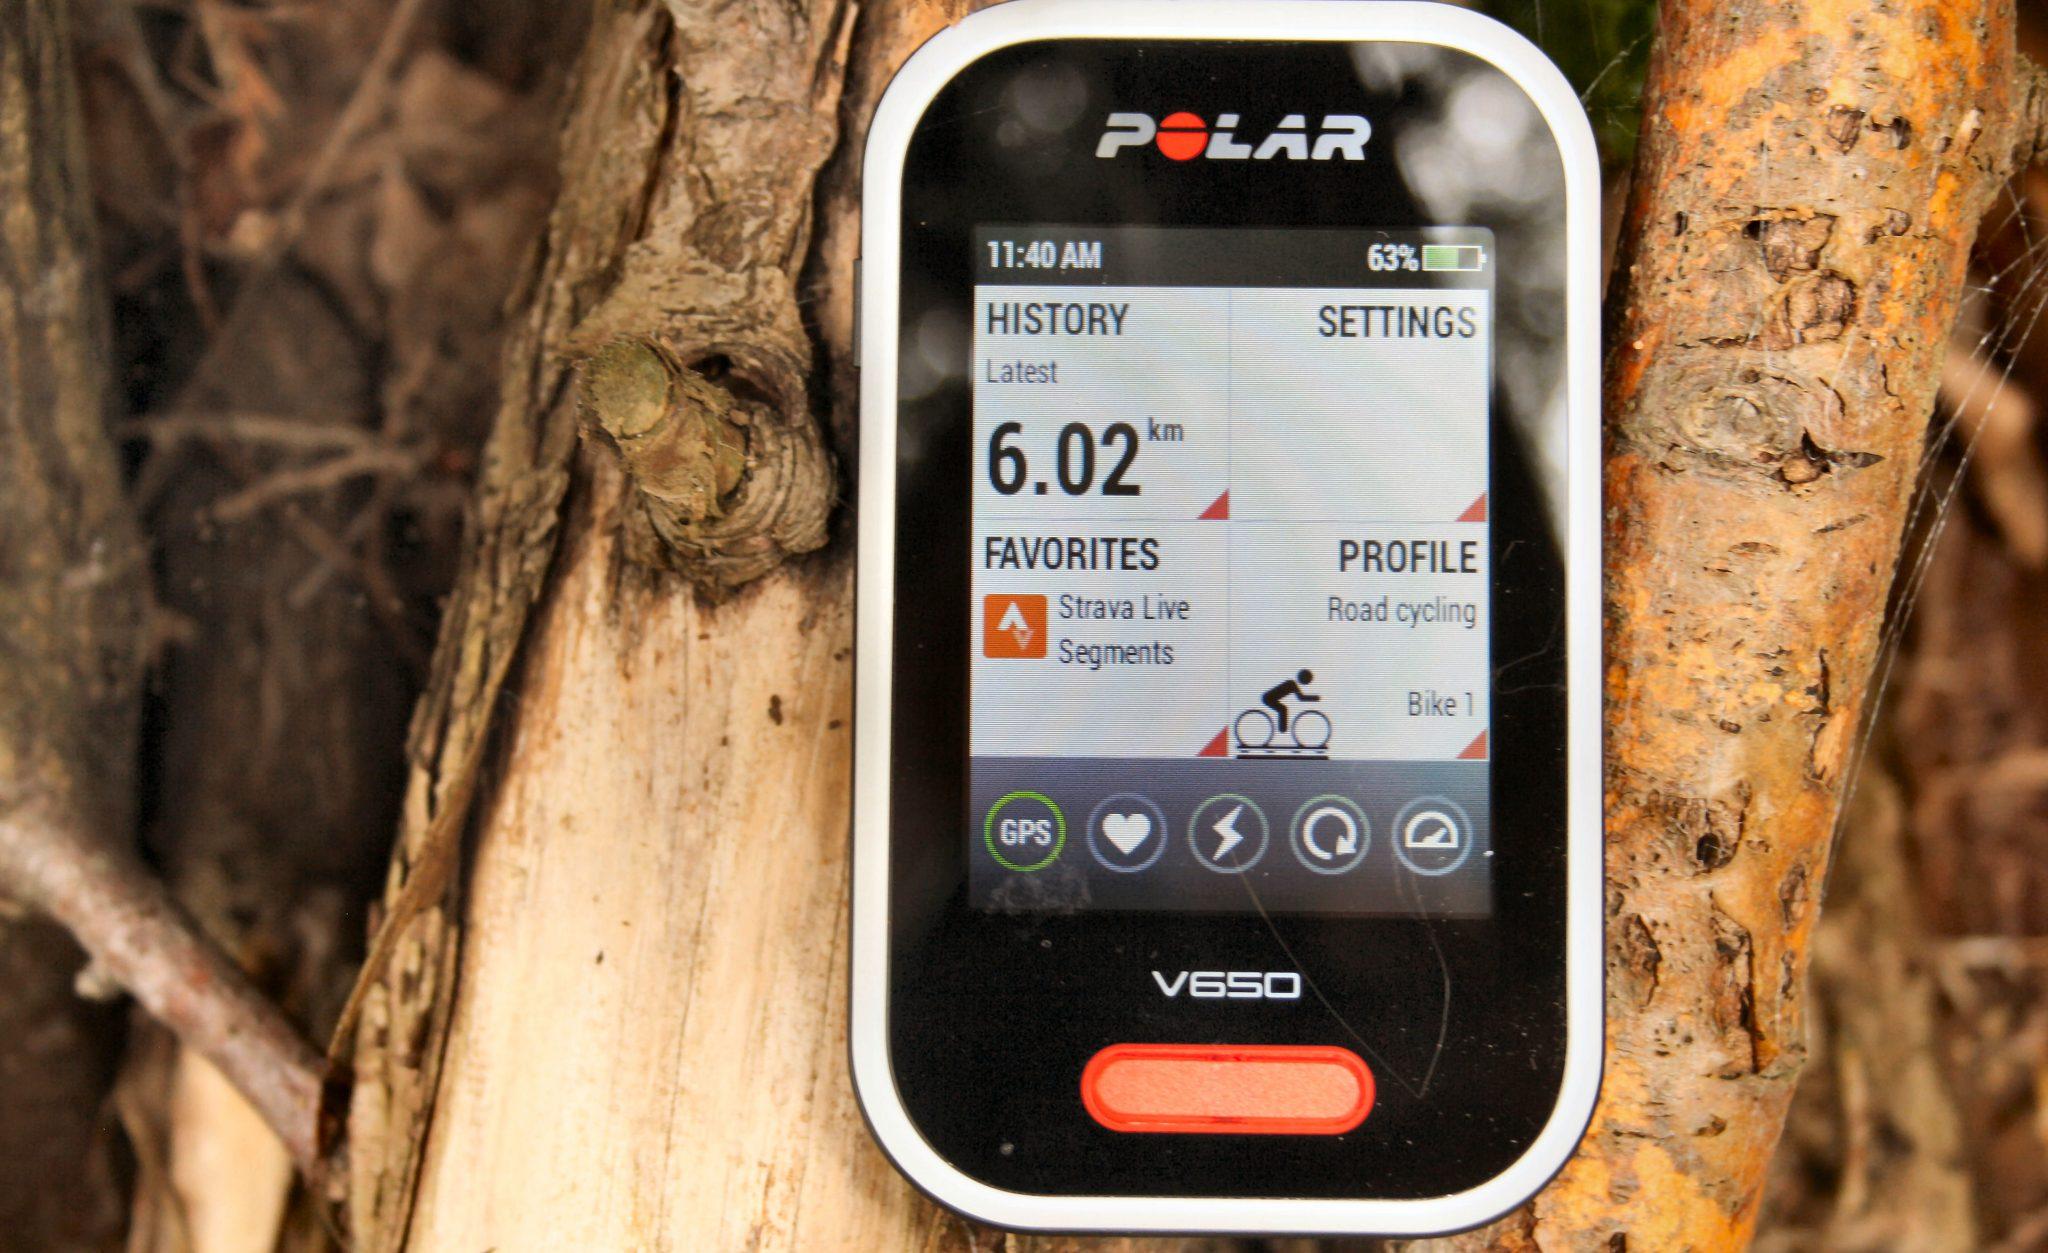 Polar V650 Review - STRAVA